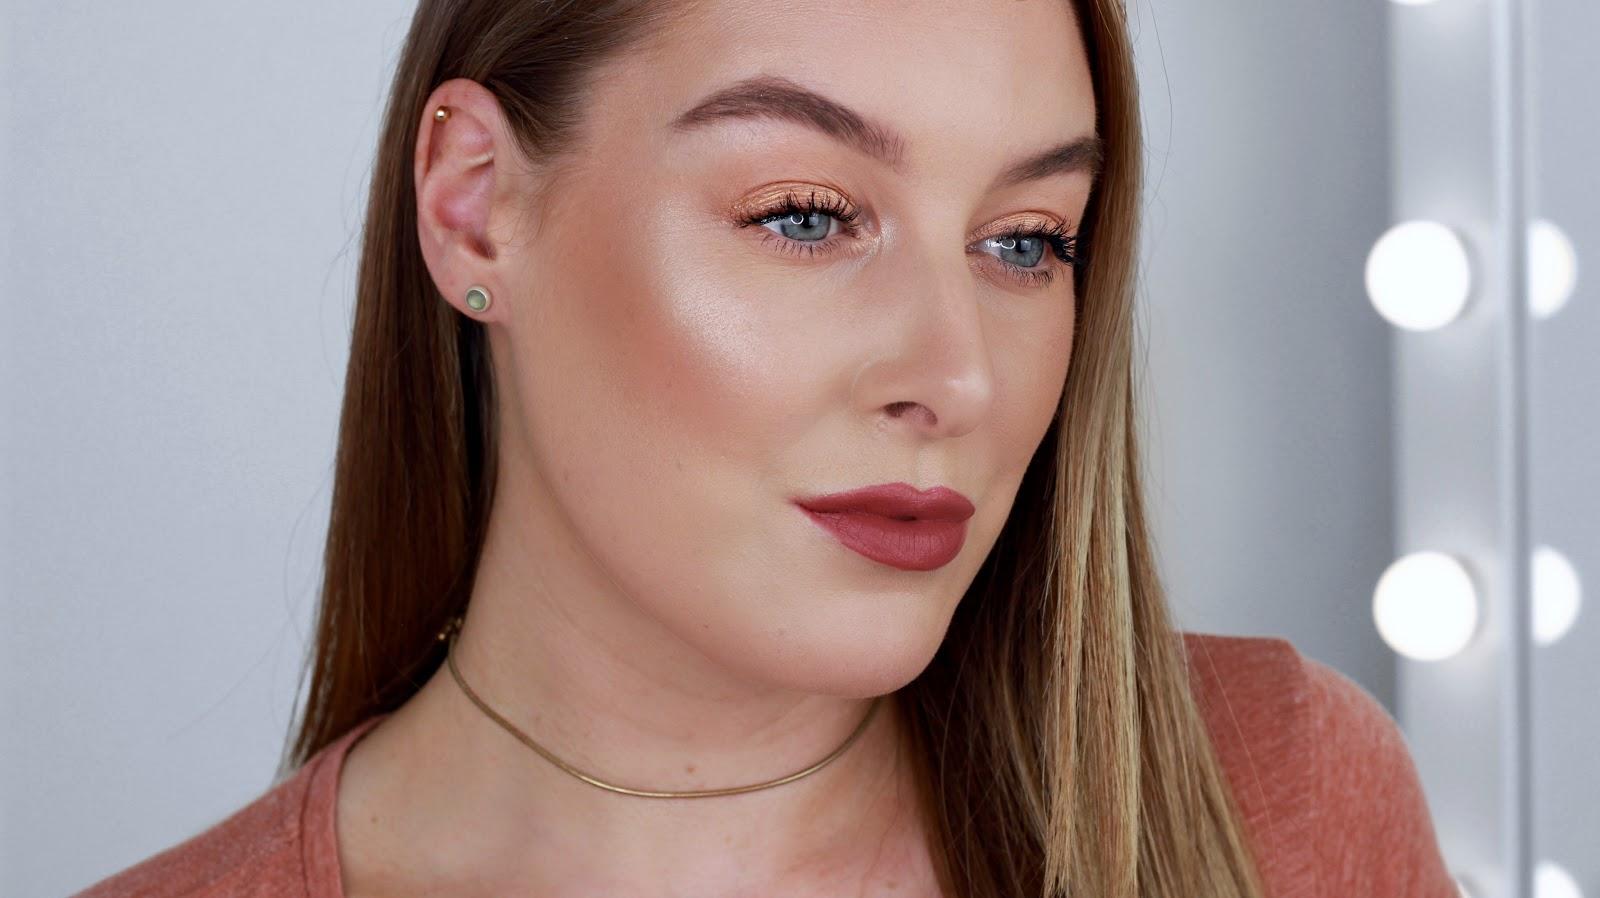 Simple 15 Minute Autumn Makeup Routine